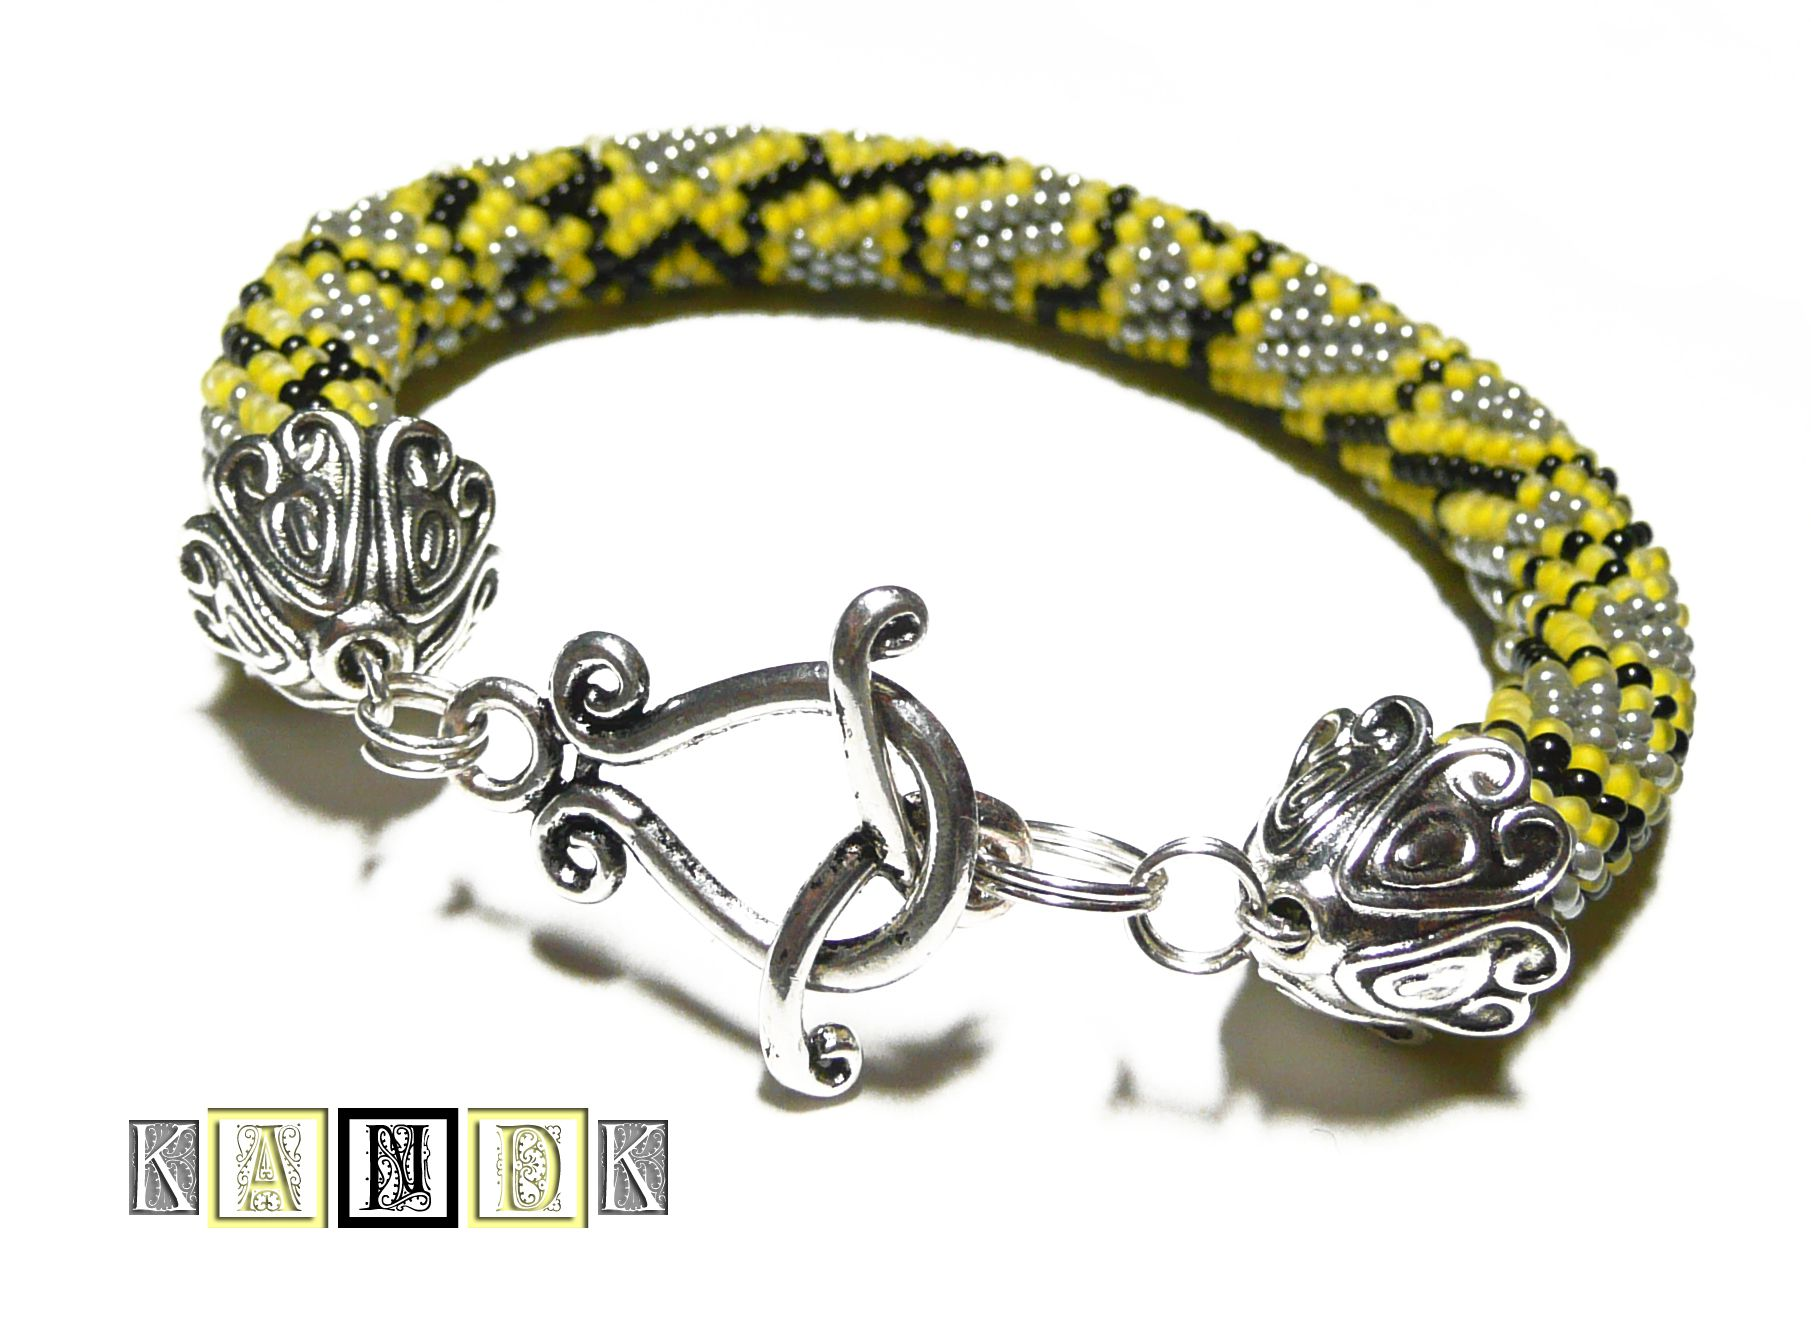 kandk beads bracelet python